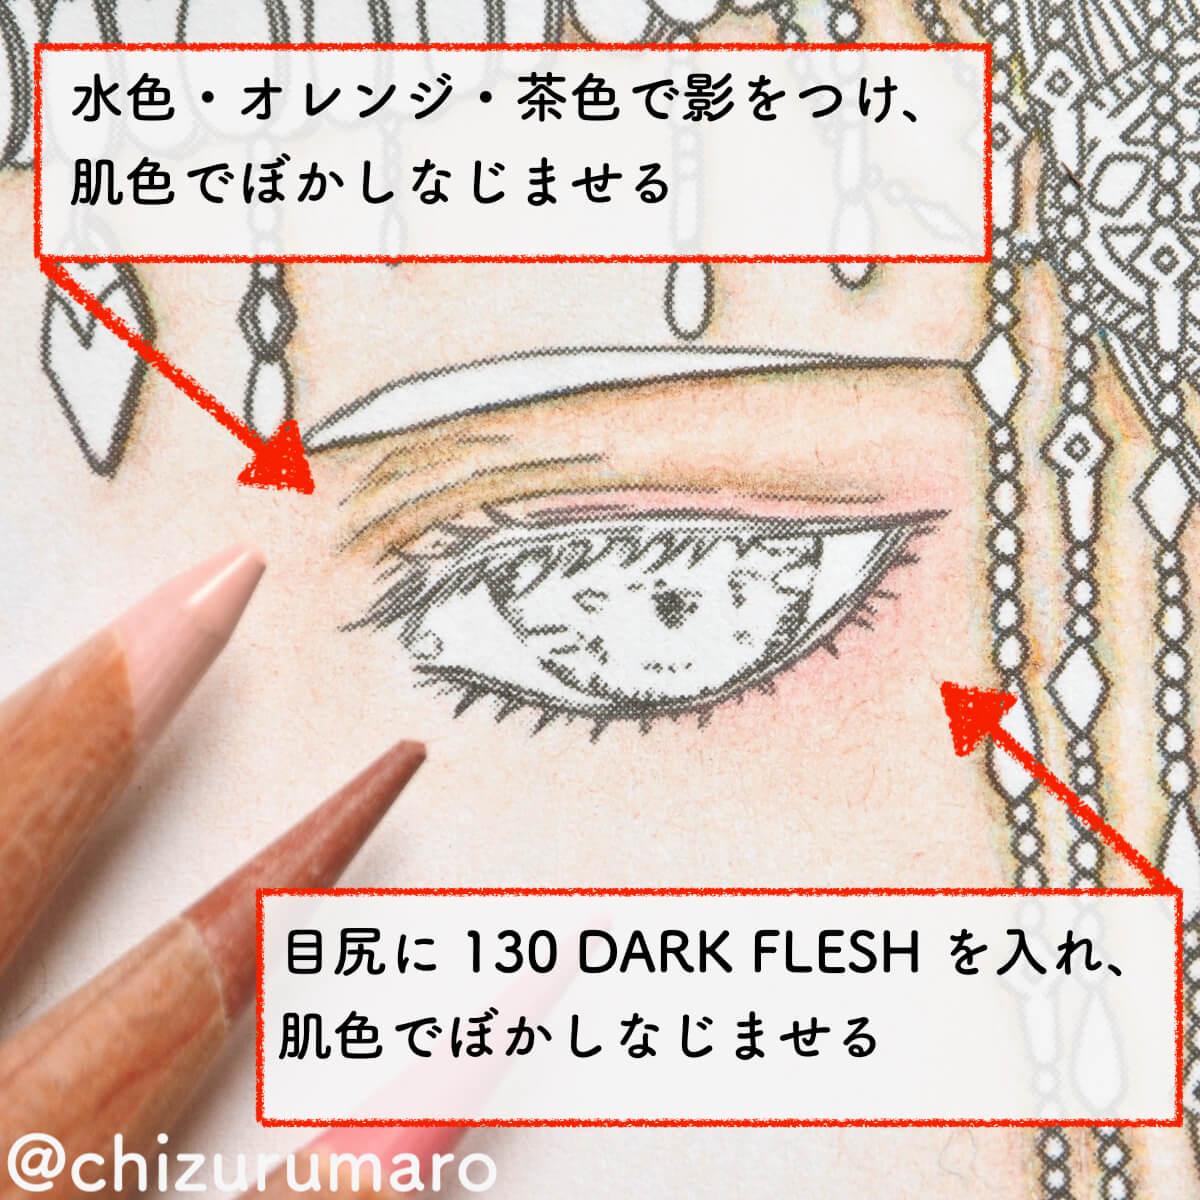 f:id:chizurumaro:20200426133455j:plain